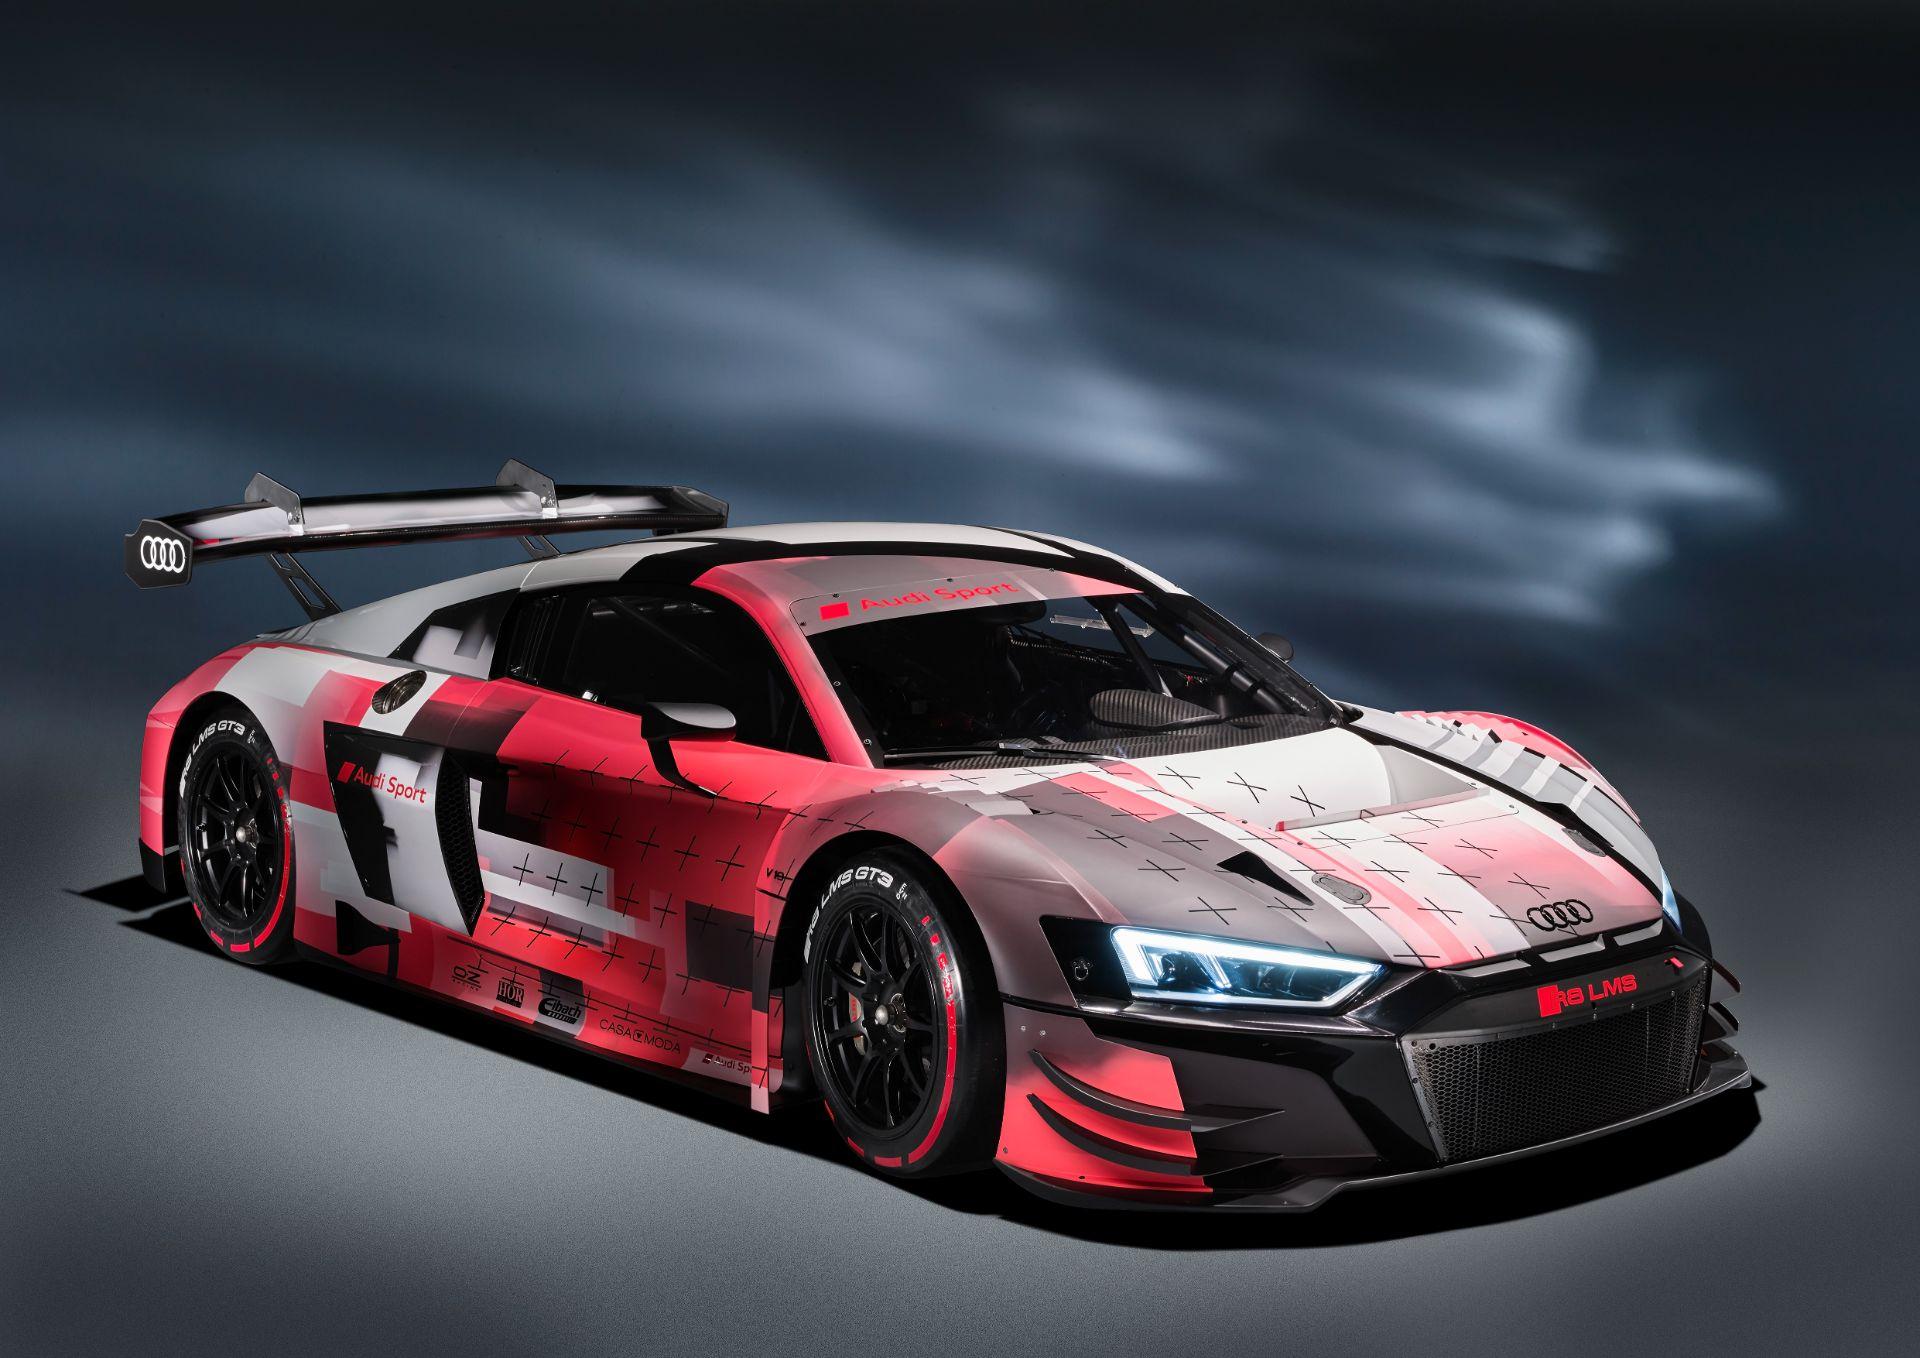 Audi-R8-LMS-GT3-Evo-II-1